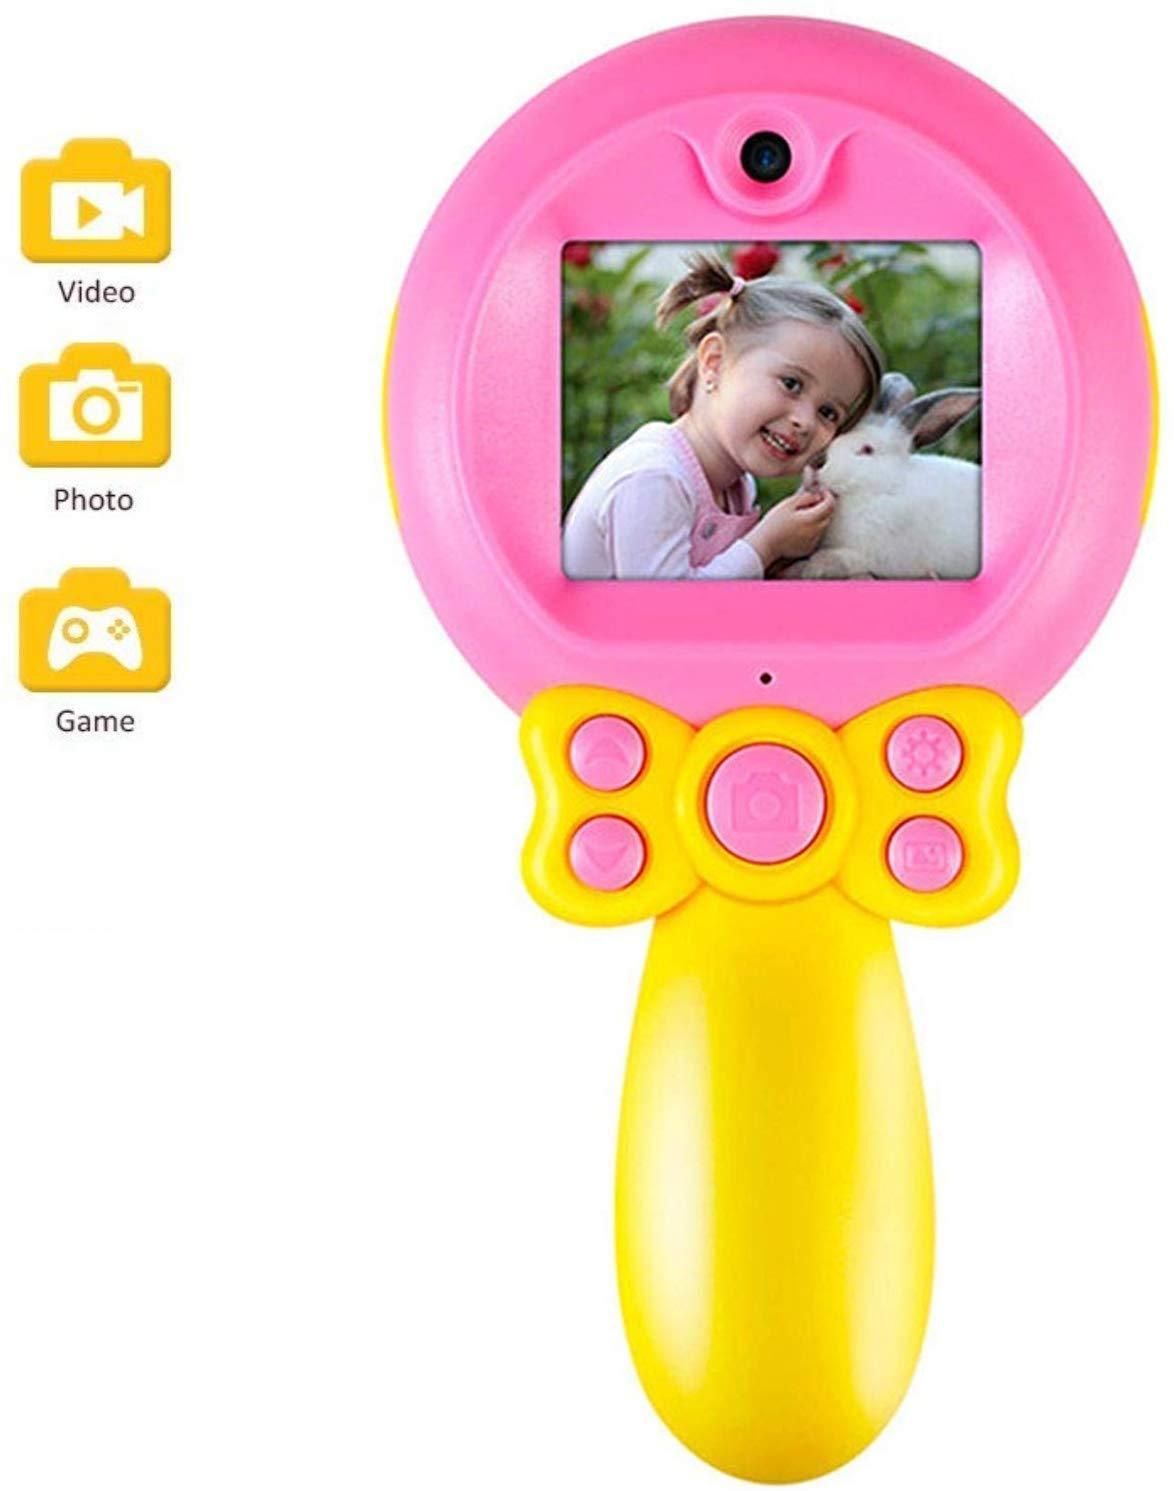 Micoke Kids Camera 1080P HD Video Kids Digital Camera Camcorder with Dual Camera